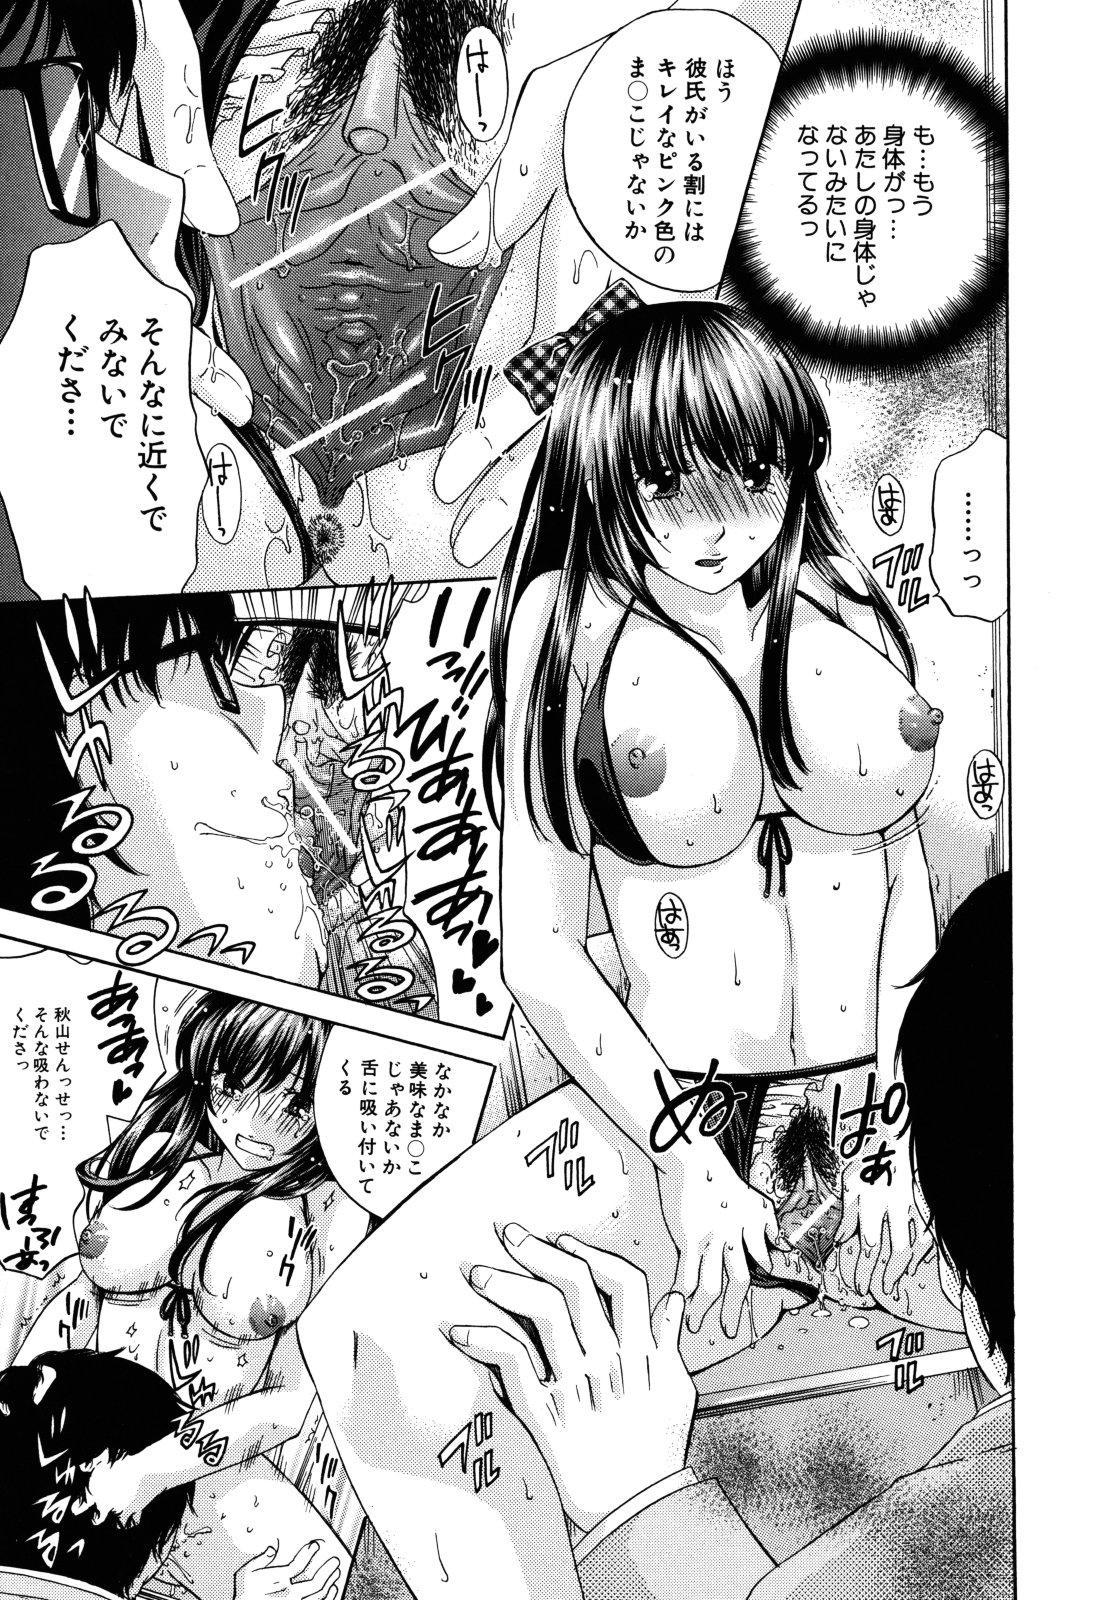 Kanojo ga Ochiru made - She in the depth 36